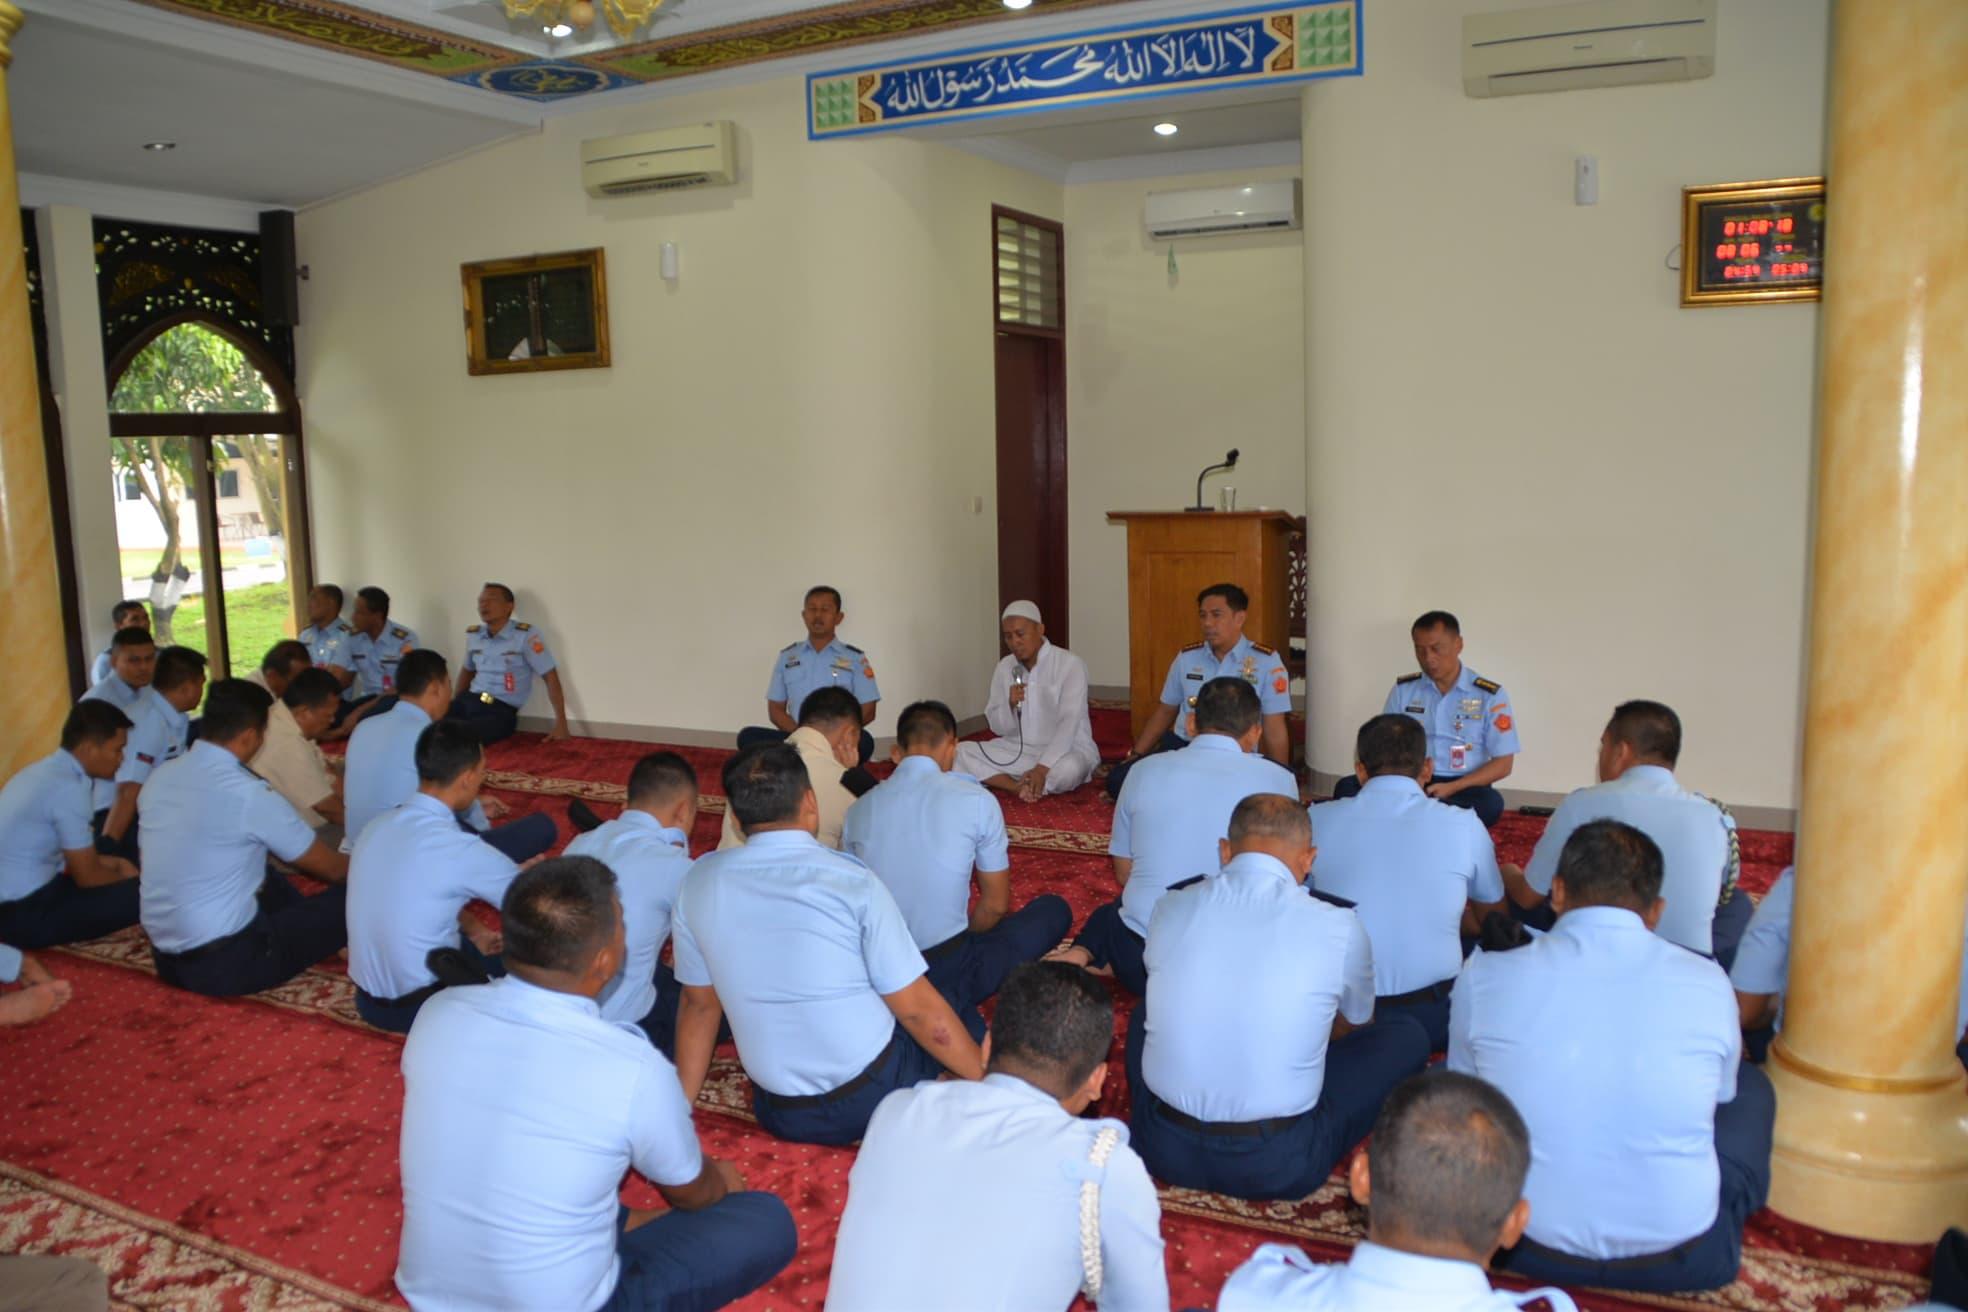 Ceramah Agama Ratiban Haji (Walimatussafar) di Kosekhanudnas III